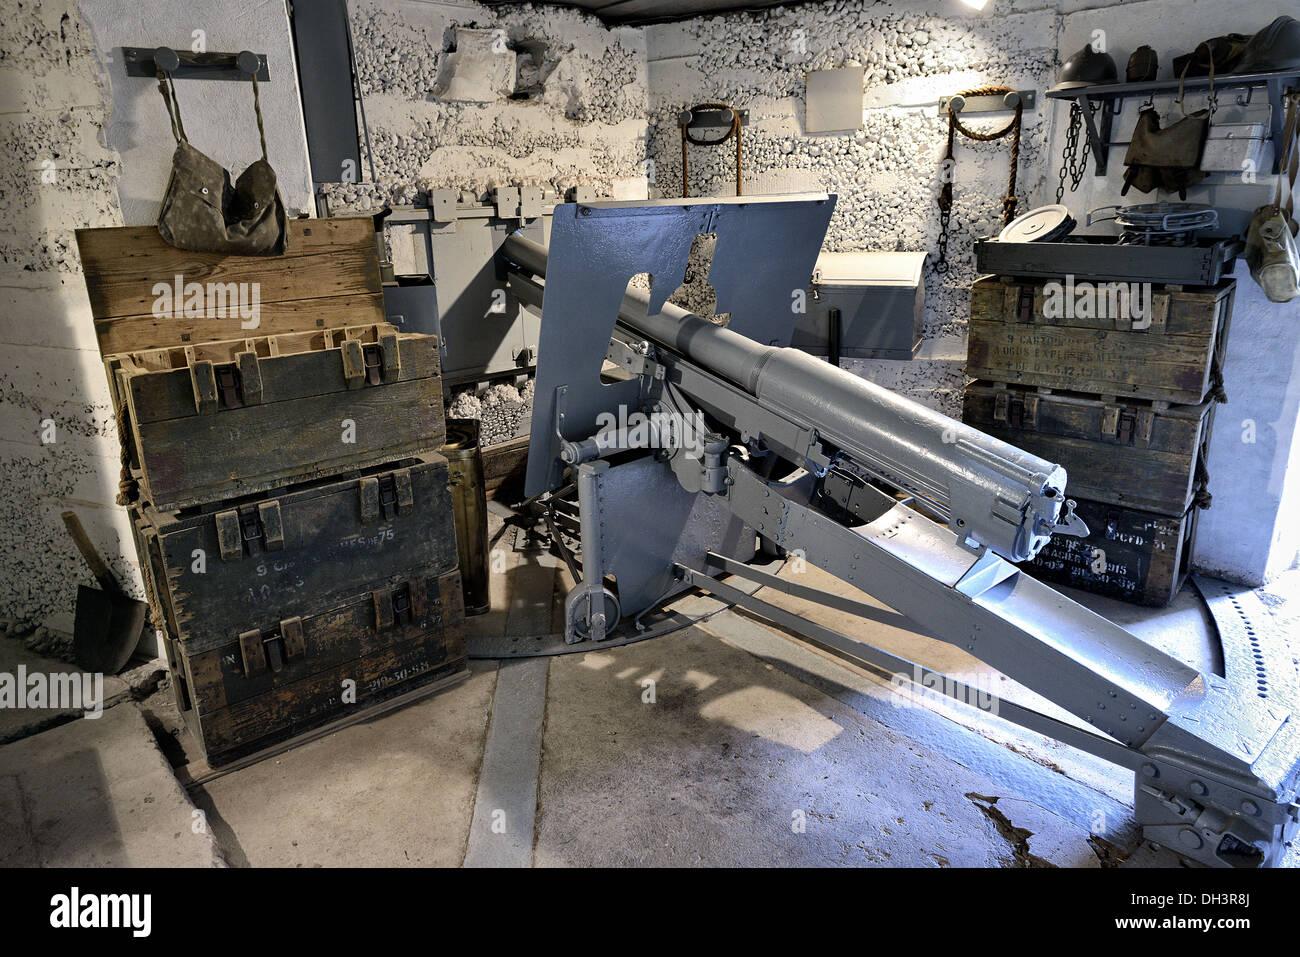 75mm gun inside La Costaude bunker, Saillant de Barst, Maginot line. - Stock Image